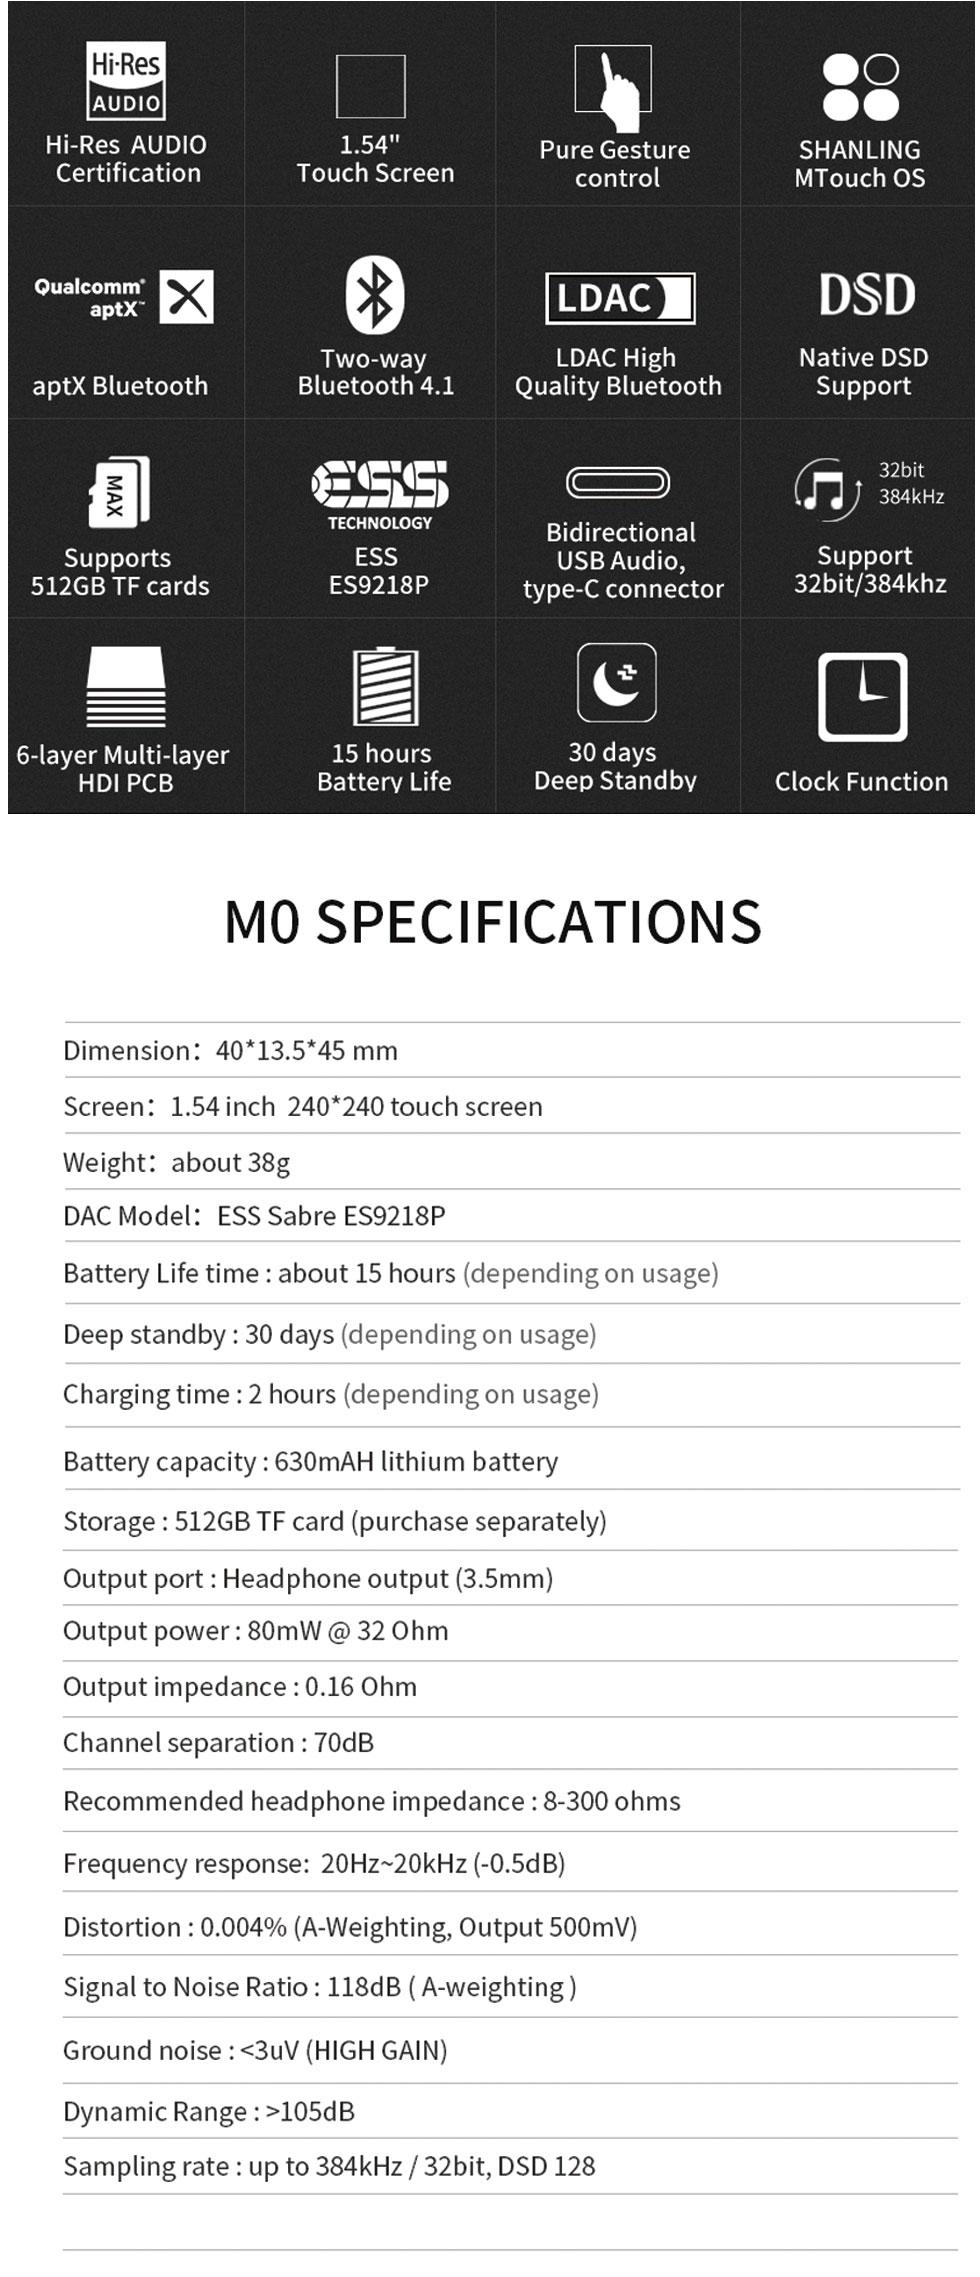 M0001_02